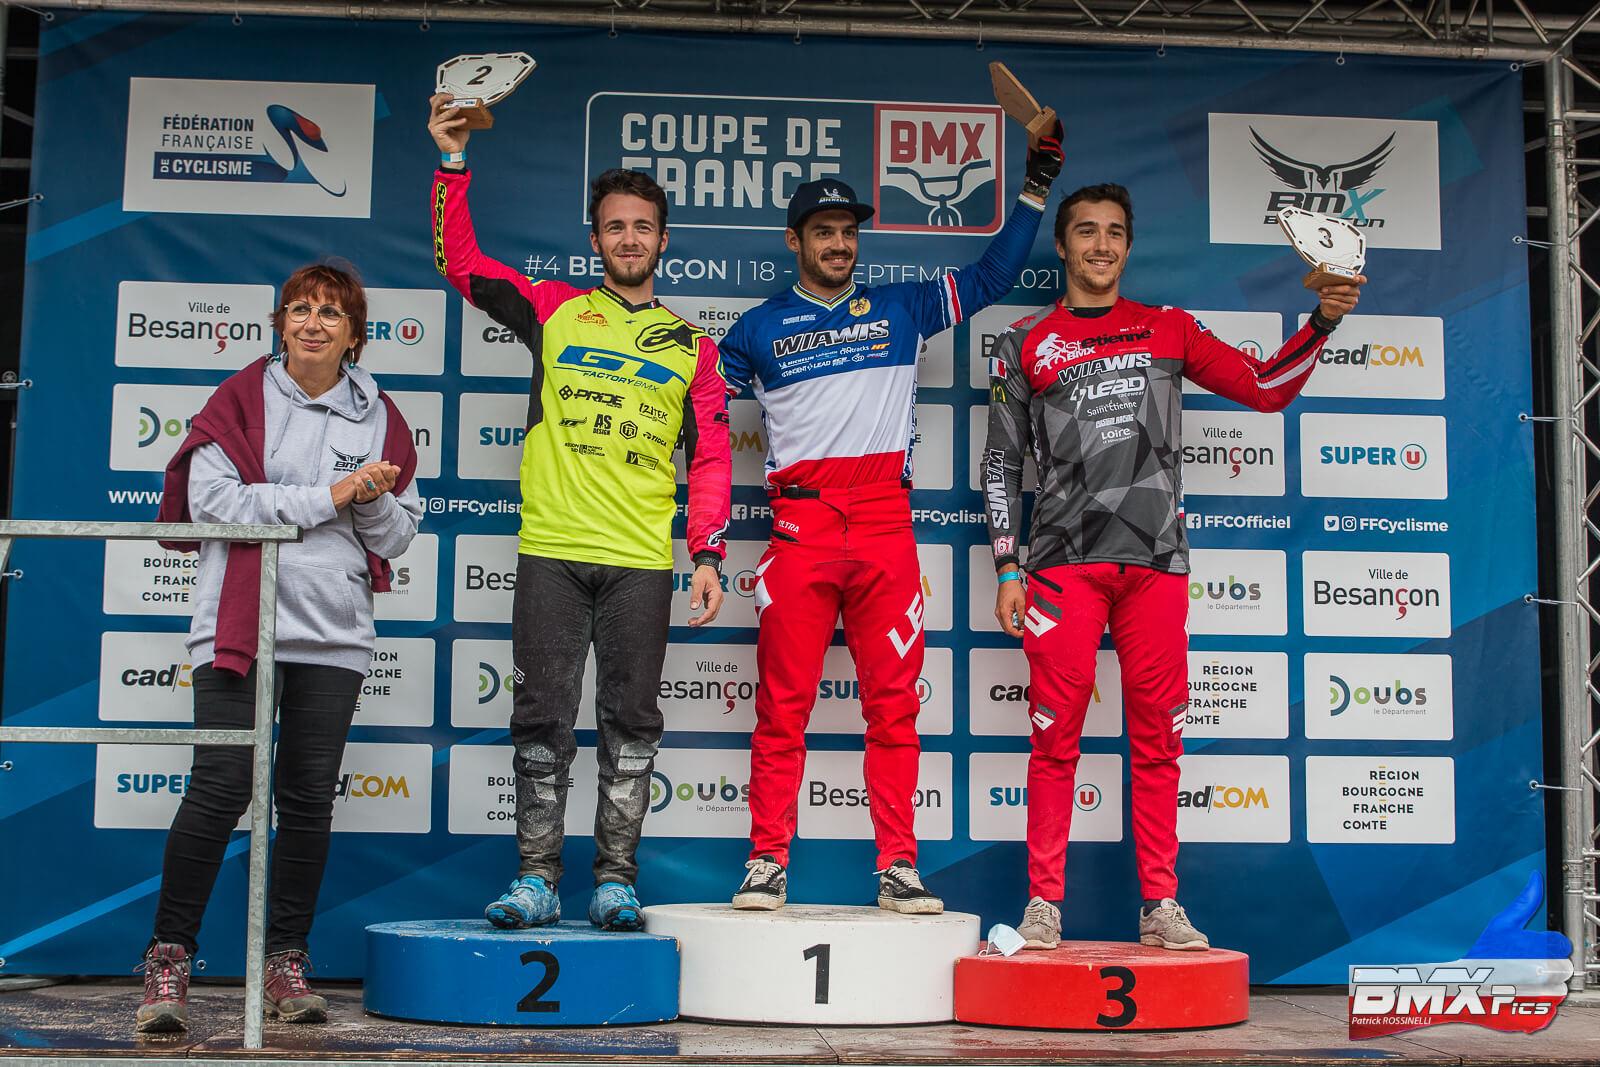 2021 French Cup Besançon - BmxPics.fr - 005